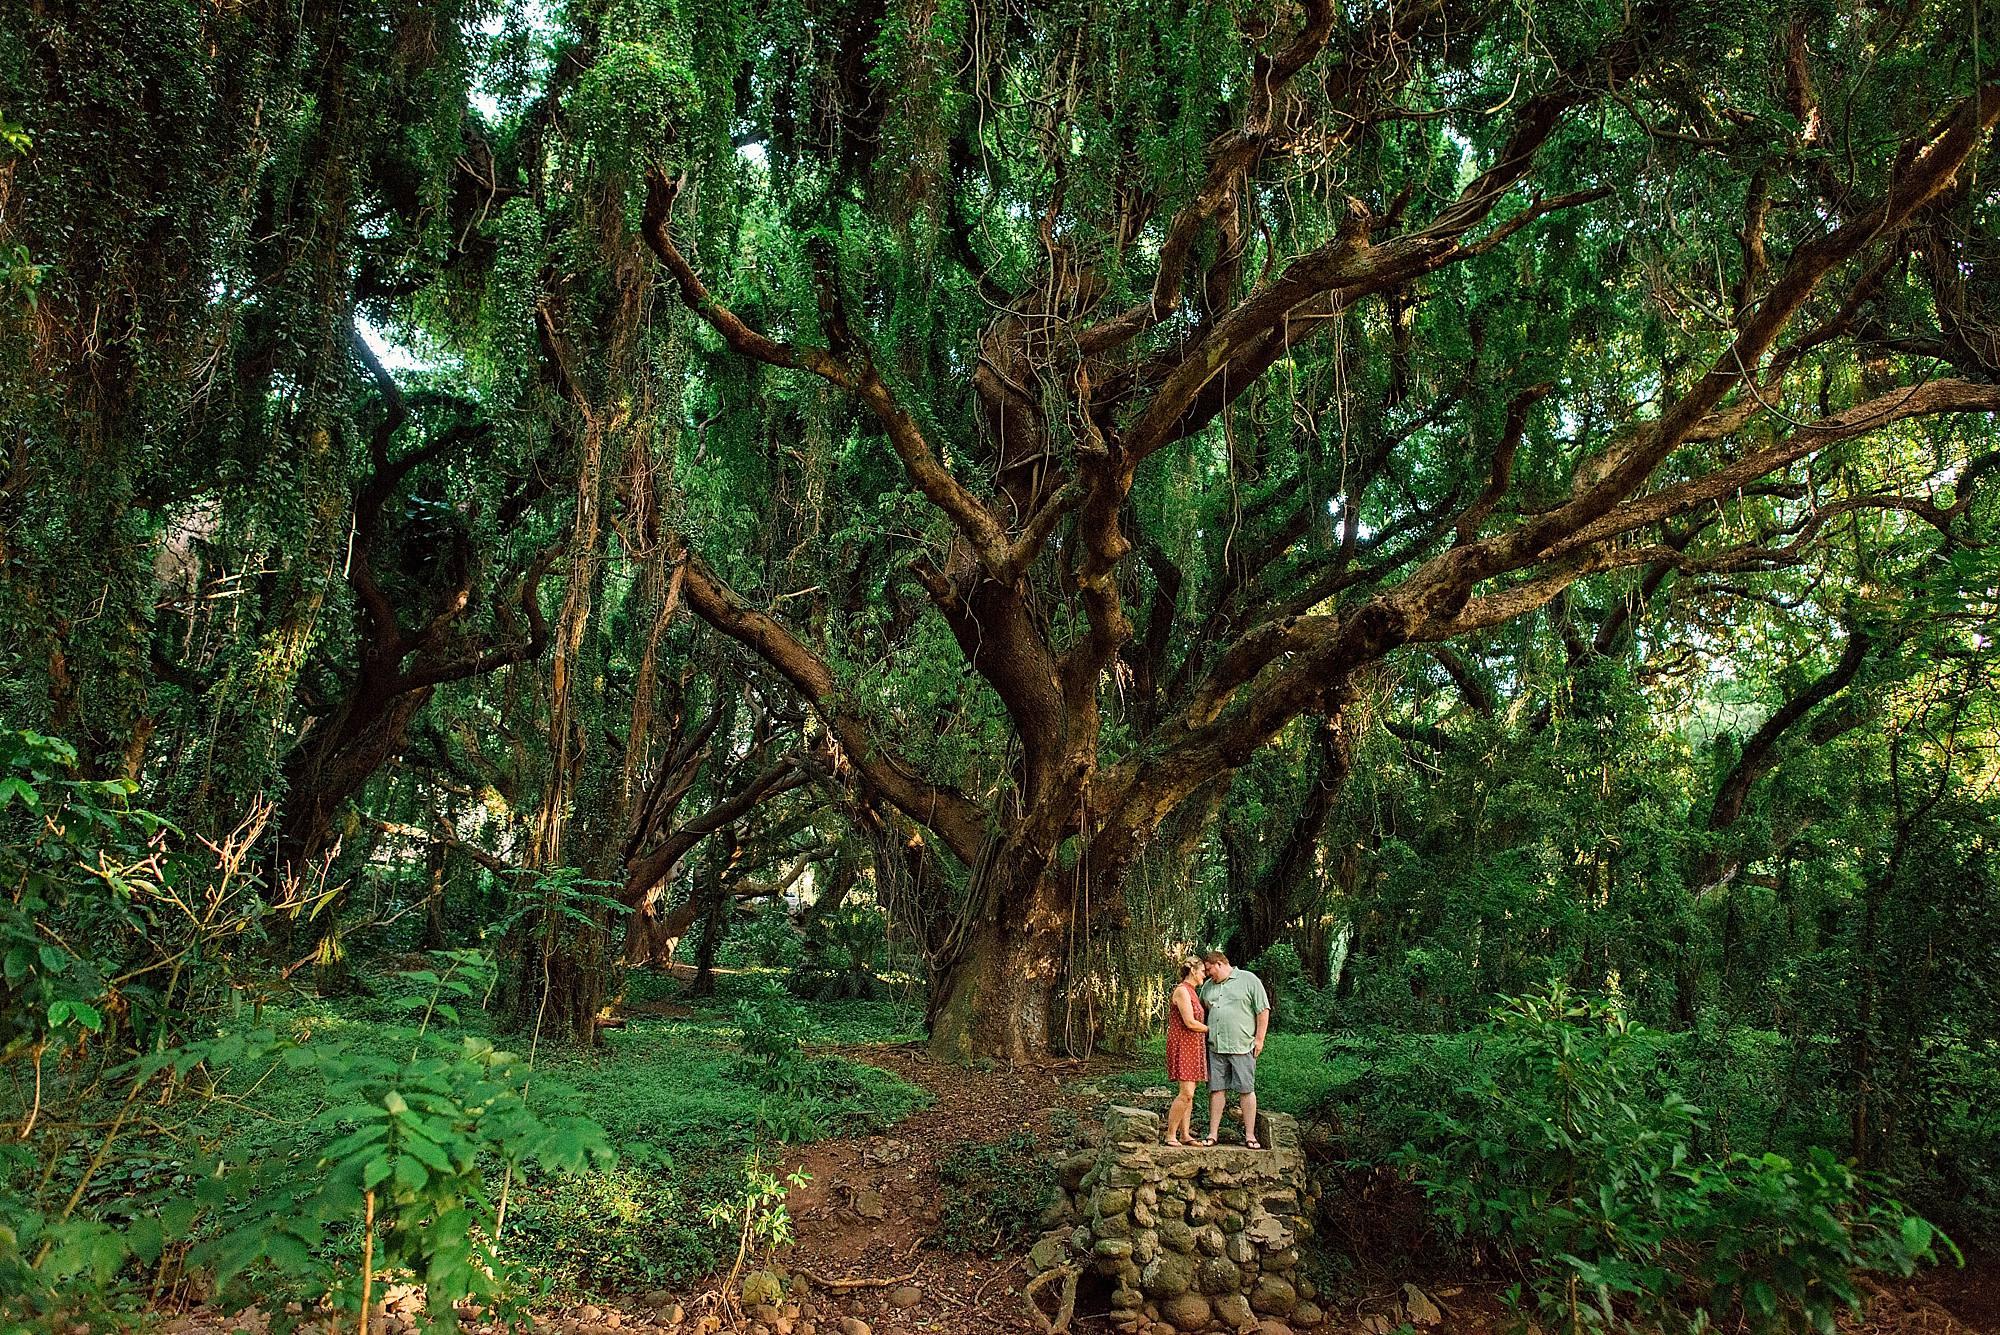 couple cuddling under banyon tree in maui, hawaii